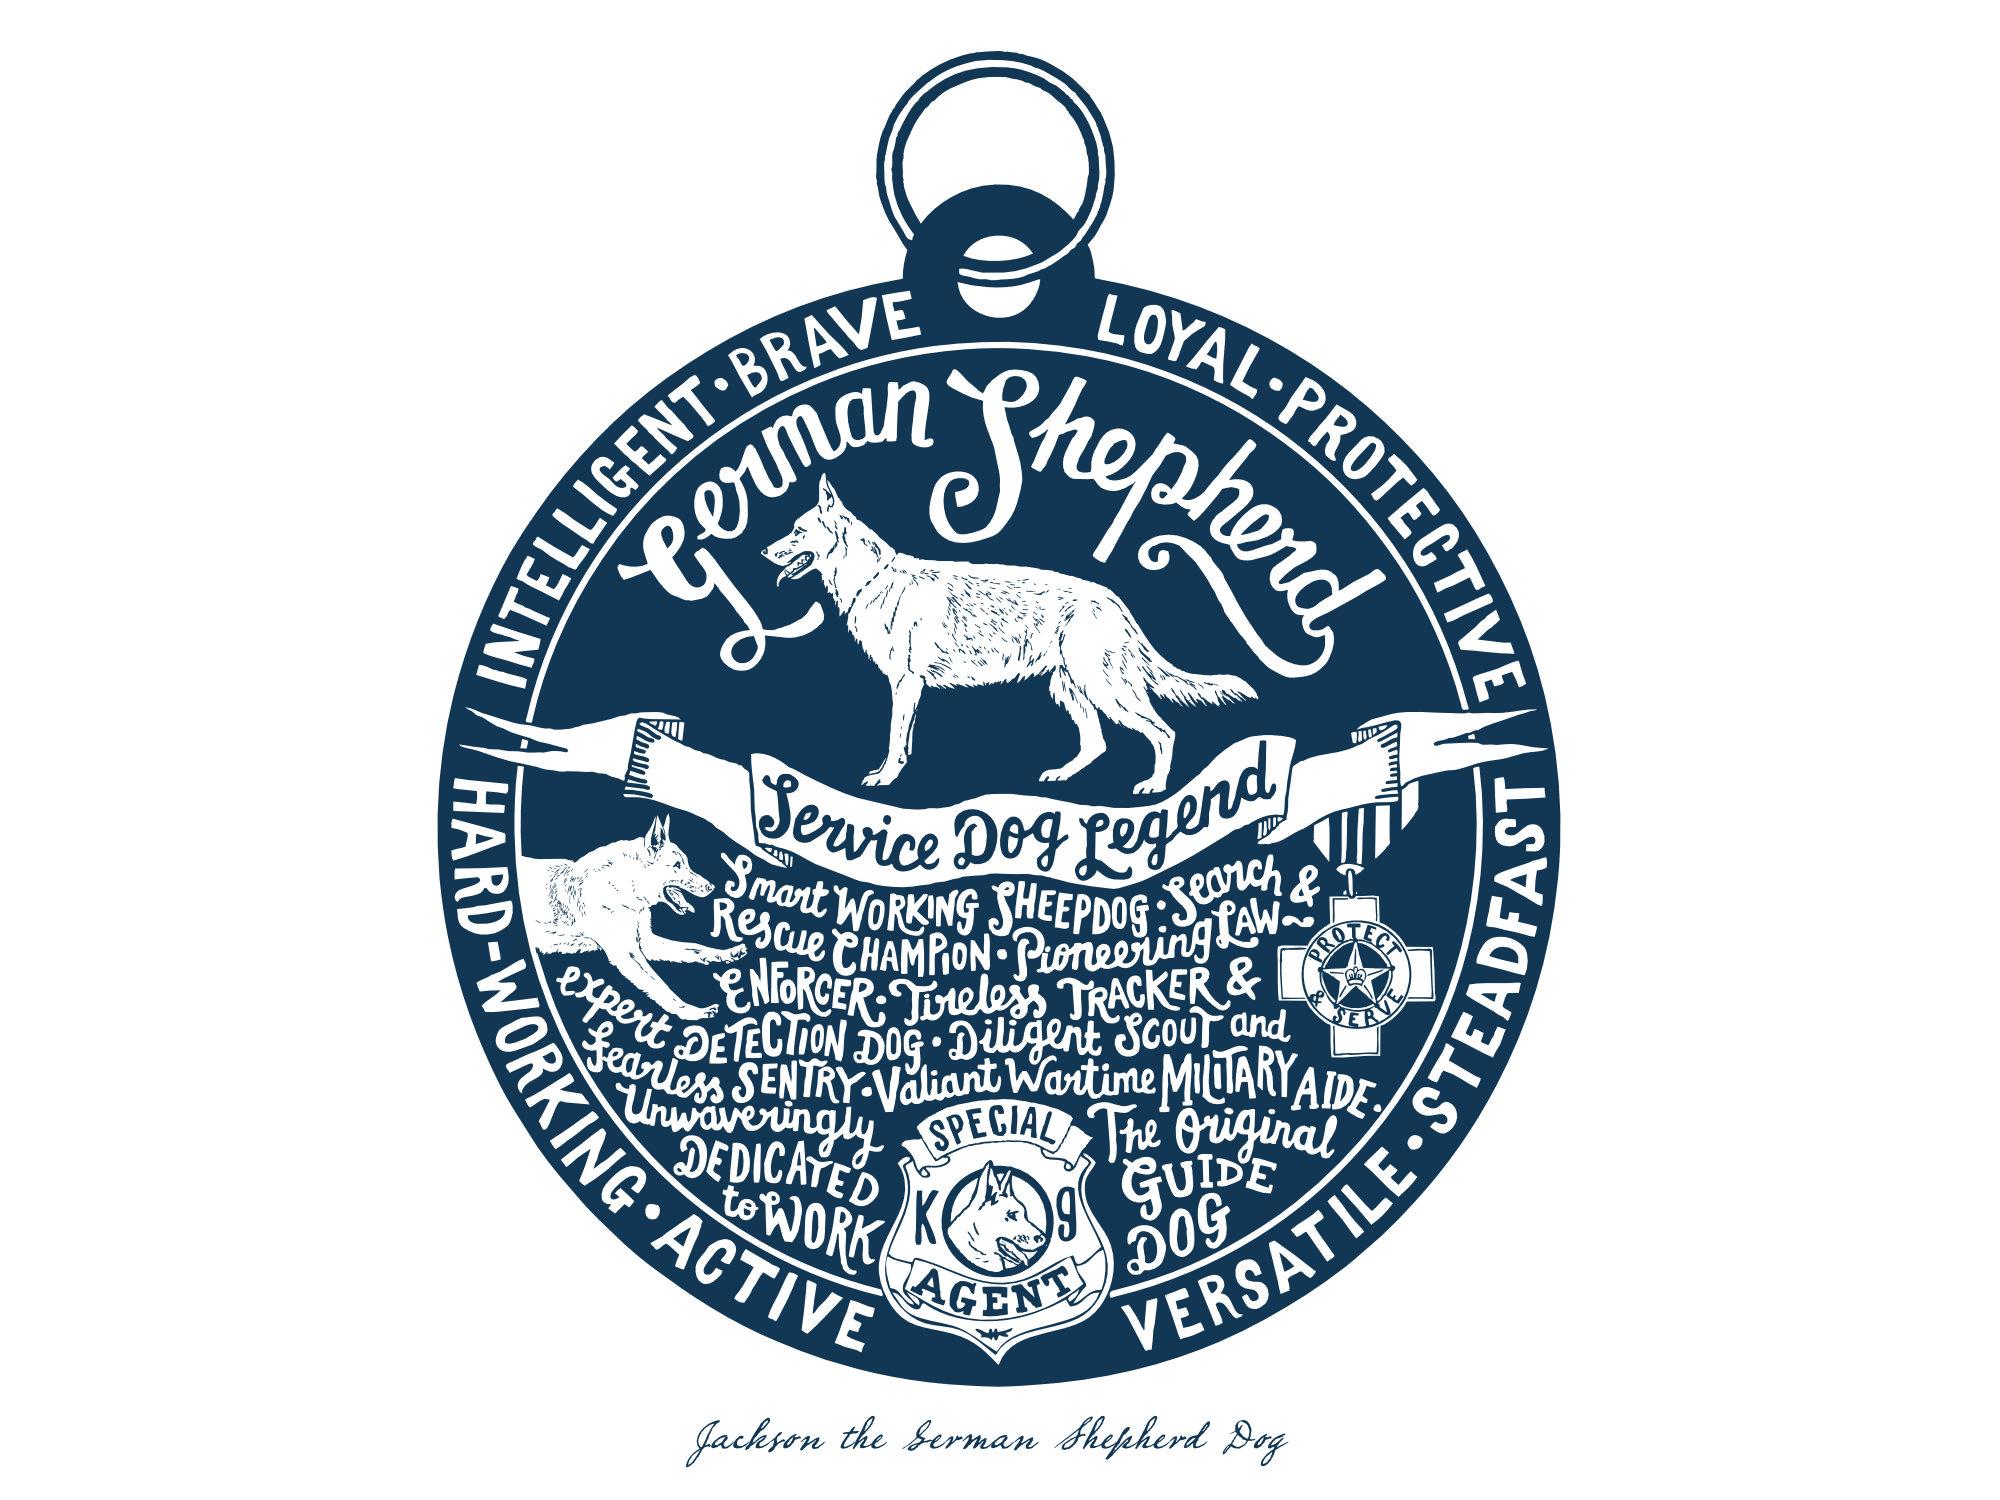 German Shepherd Dog Alsatian prints - Hand lettering & Illustration by Debbie Kendall